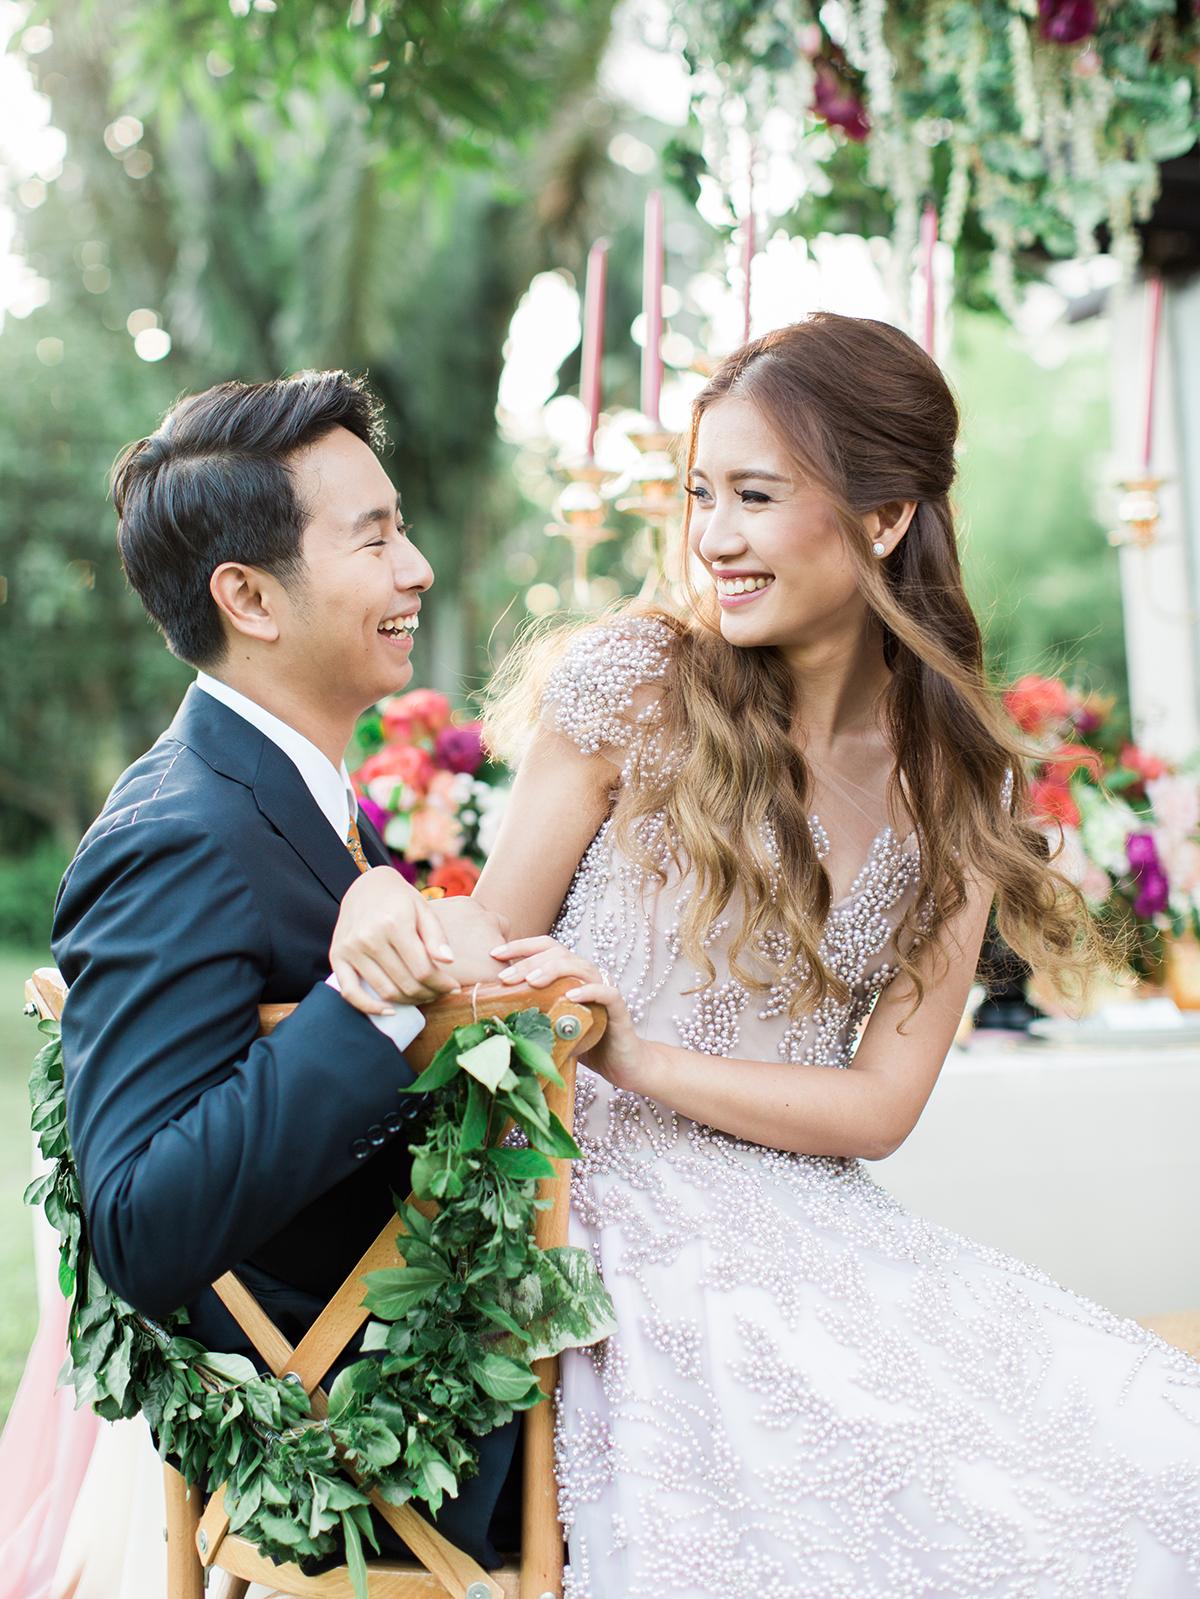 philippine wedding photographer 9